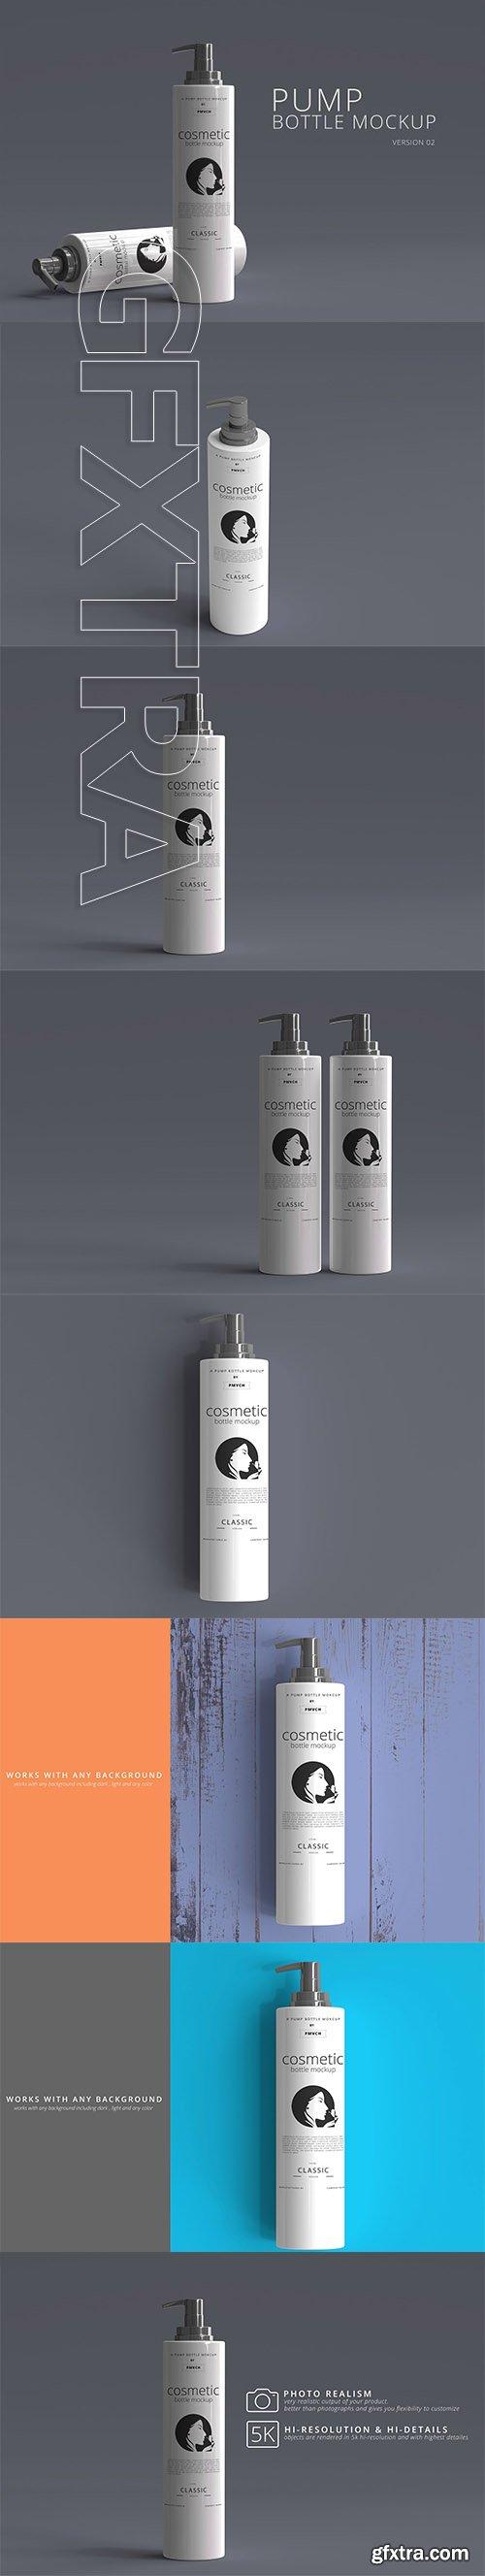 CreativeMarket - Pump Bottle Mockup 01 2993967